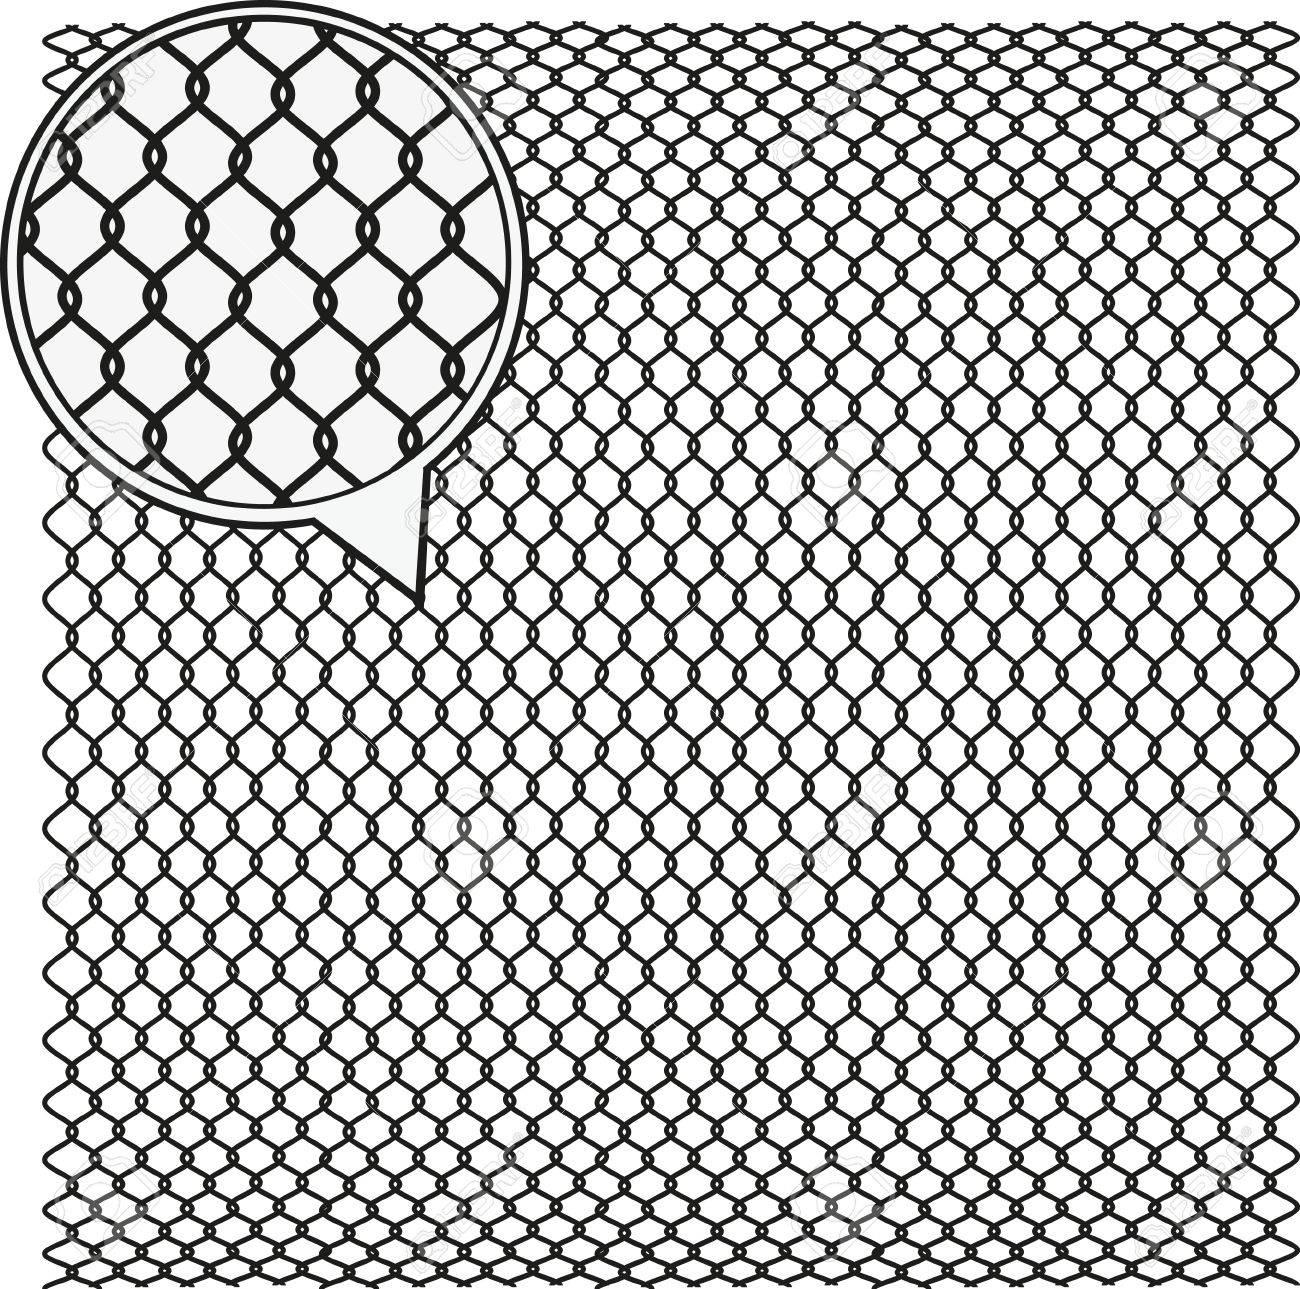 Steel Wire Texture - Octagon Background. Vector Illustration ...